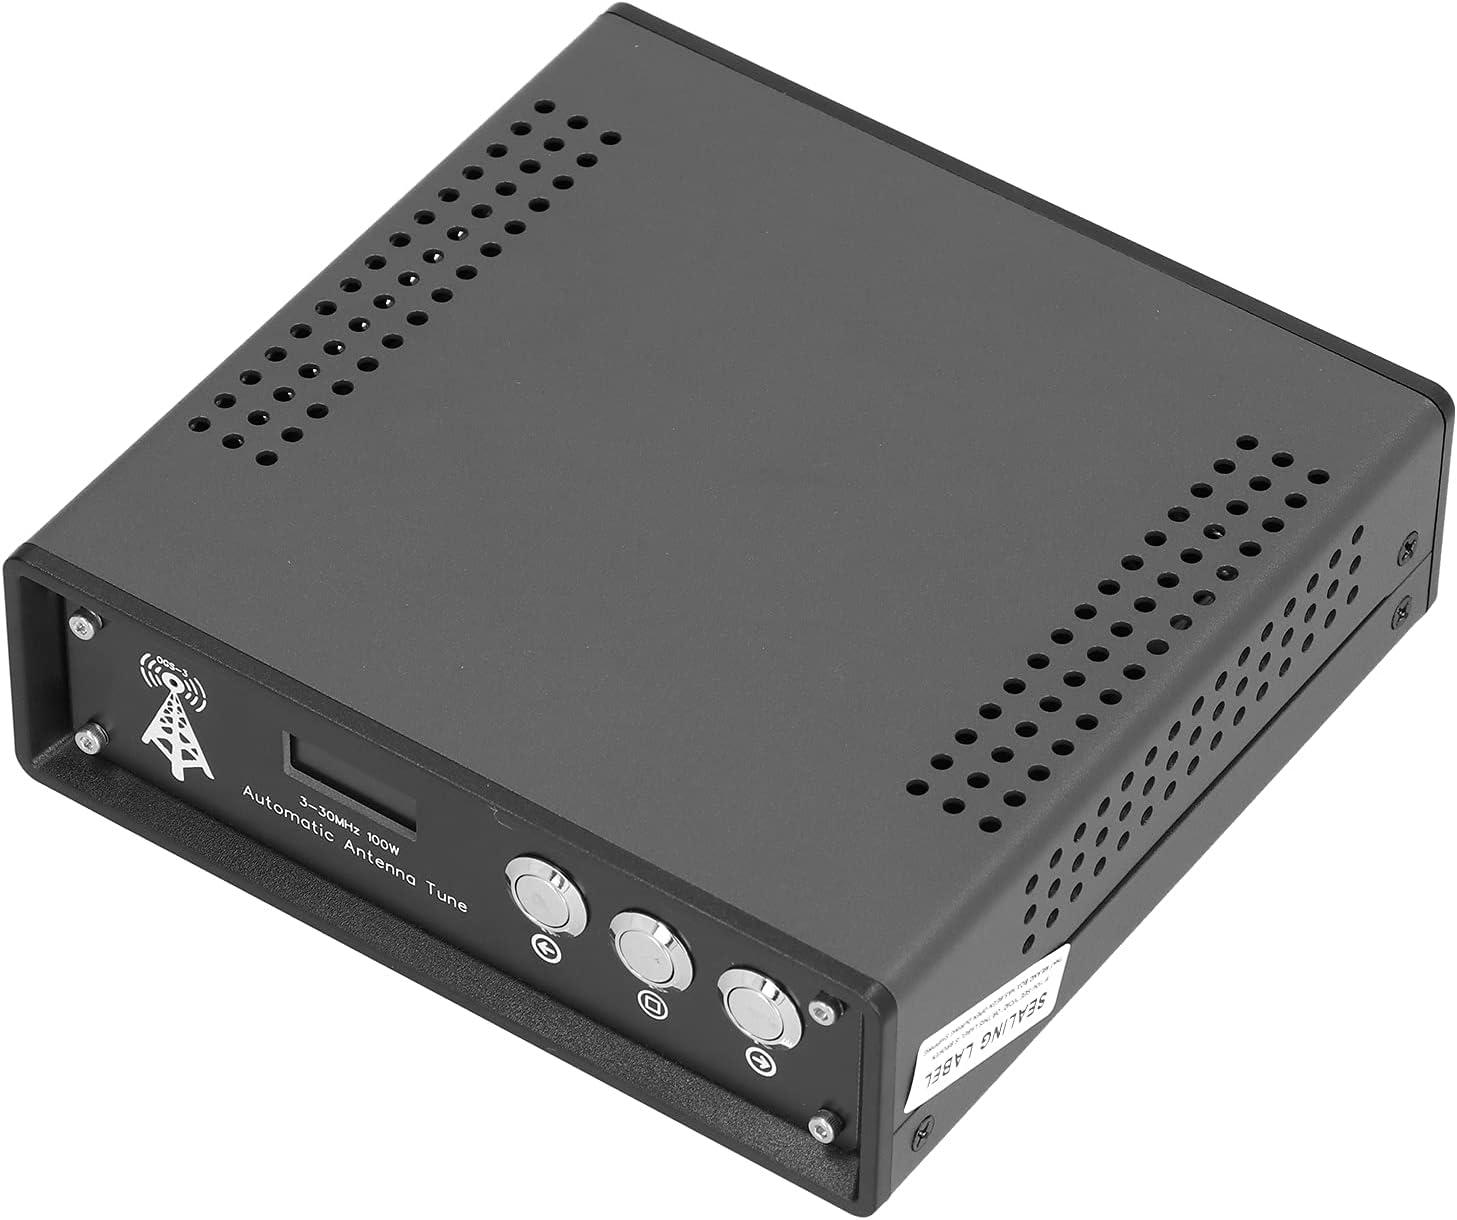 CUTULAMO Cash special price Shortwave Antenna Tuner Cable USB Super-cheap Large